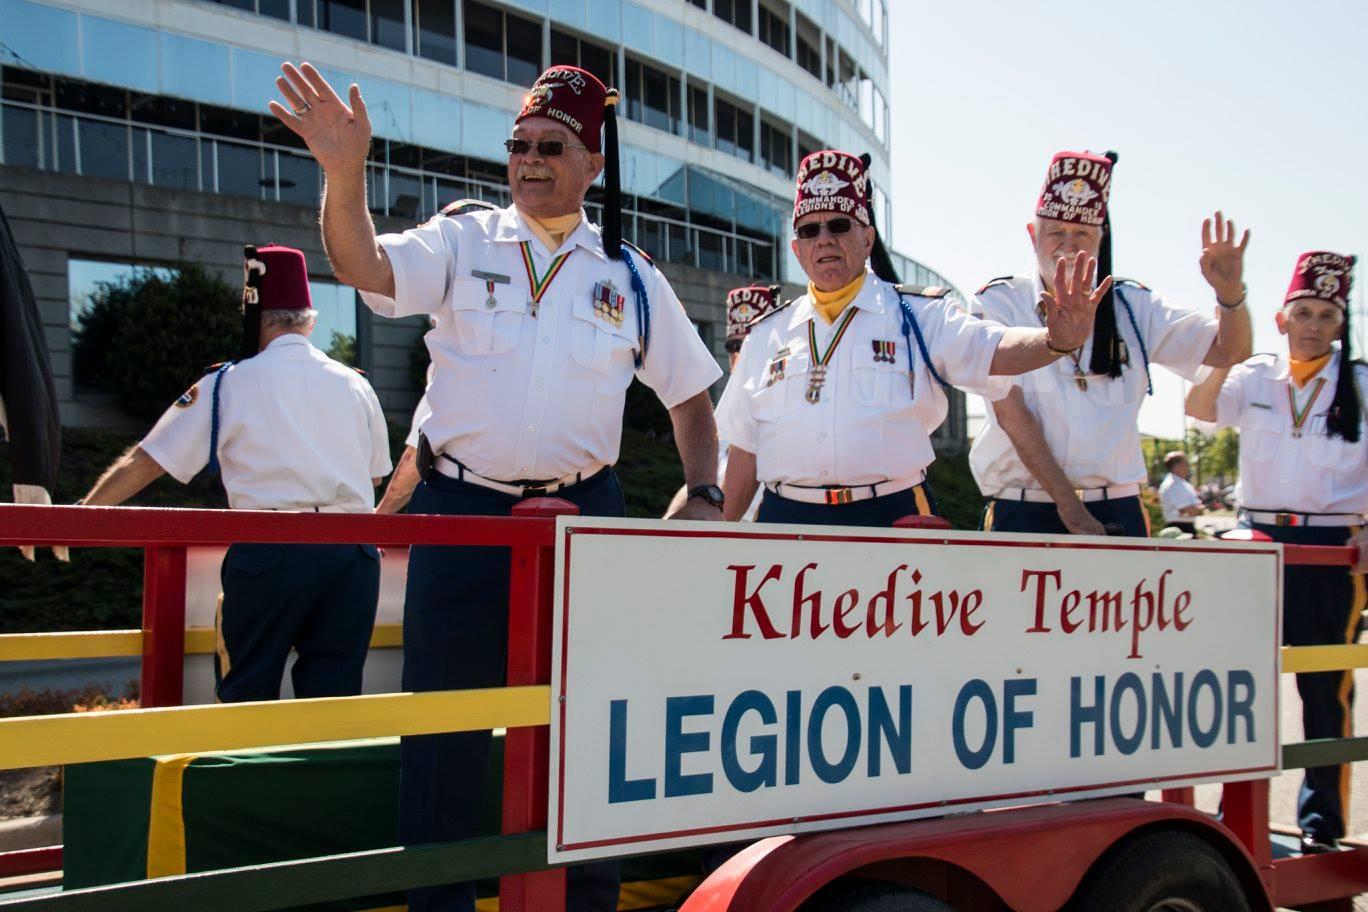 Norfolk Nato Parade Khedive Shriners